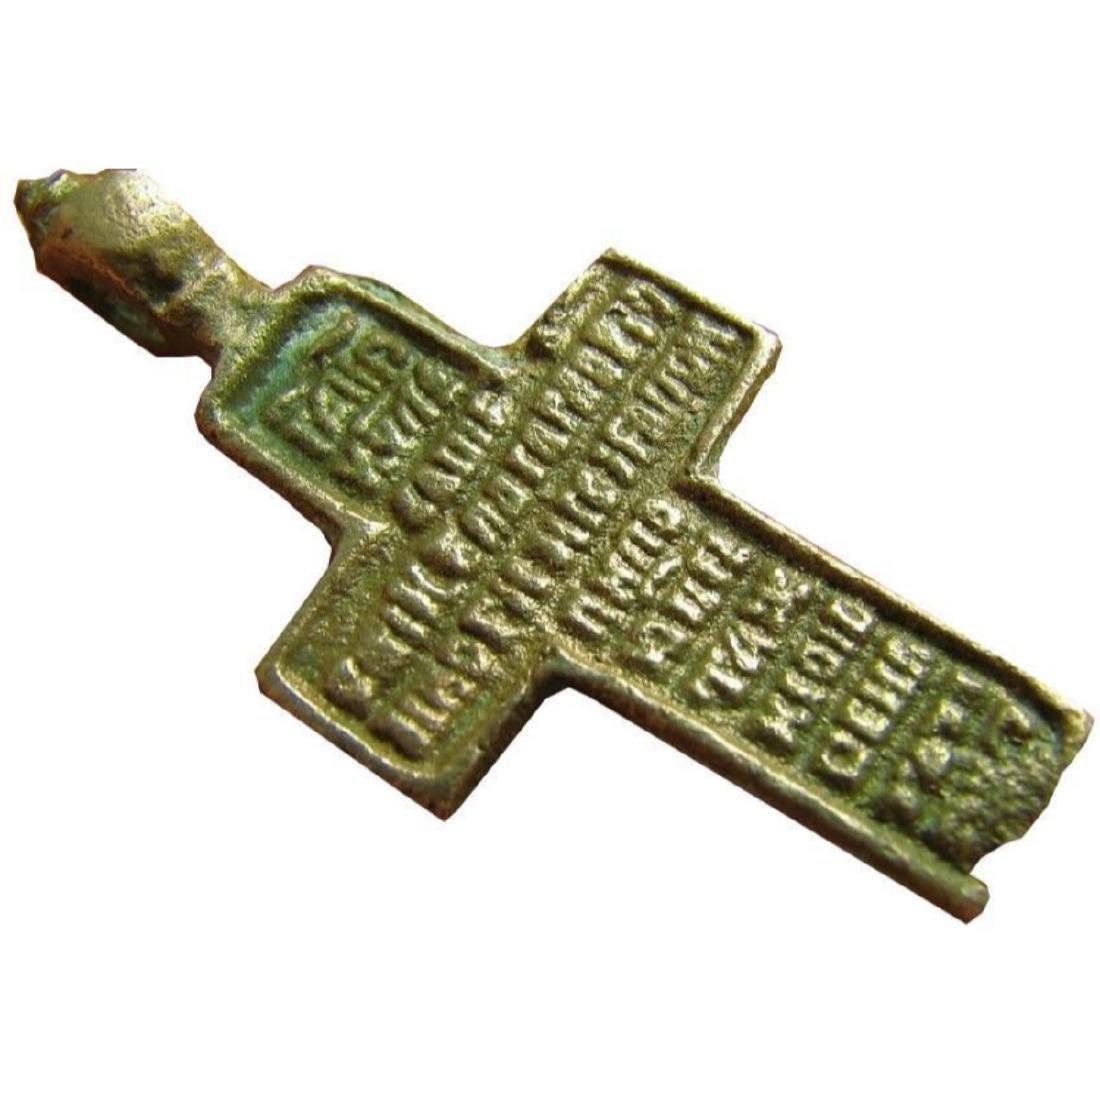 Prayer Big Relief Late Medieval Church Bronze Cross - 4